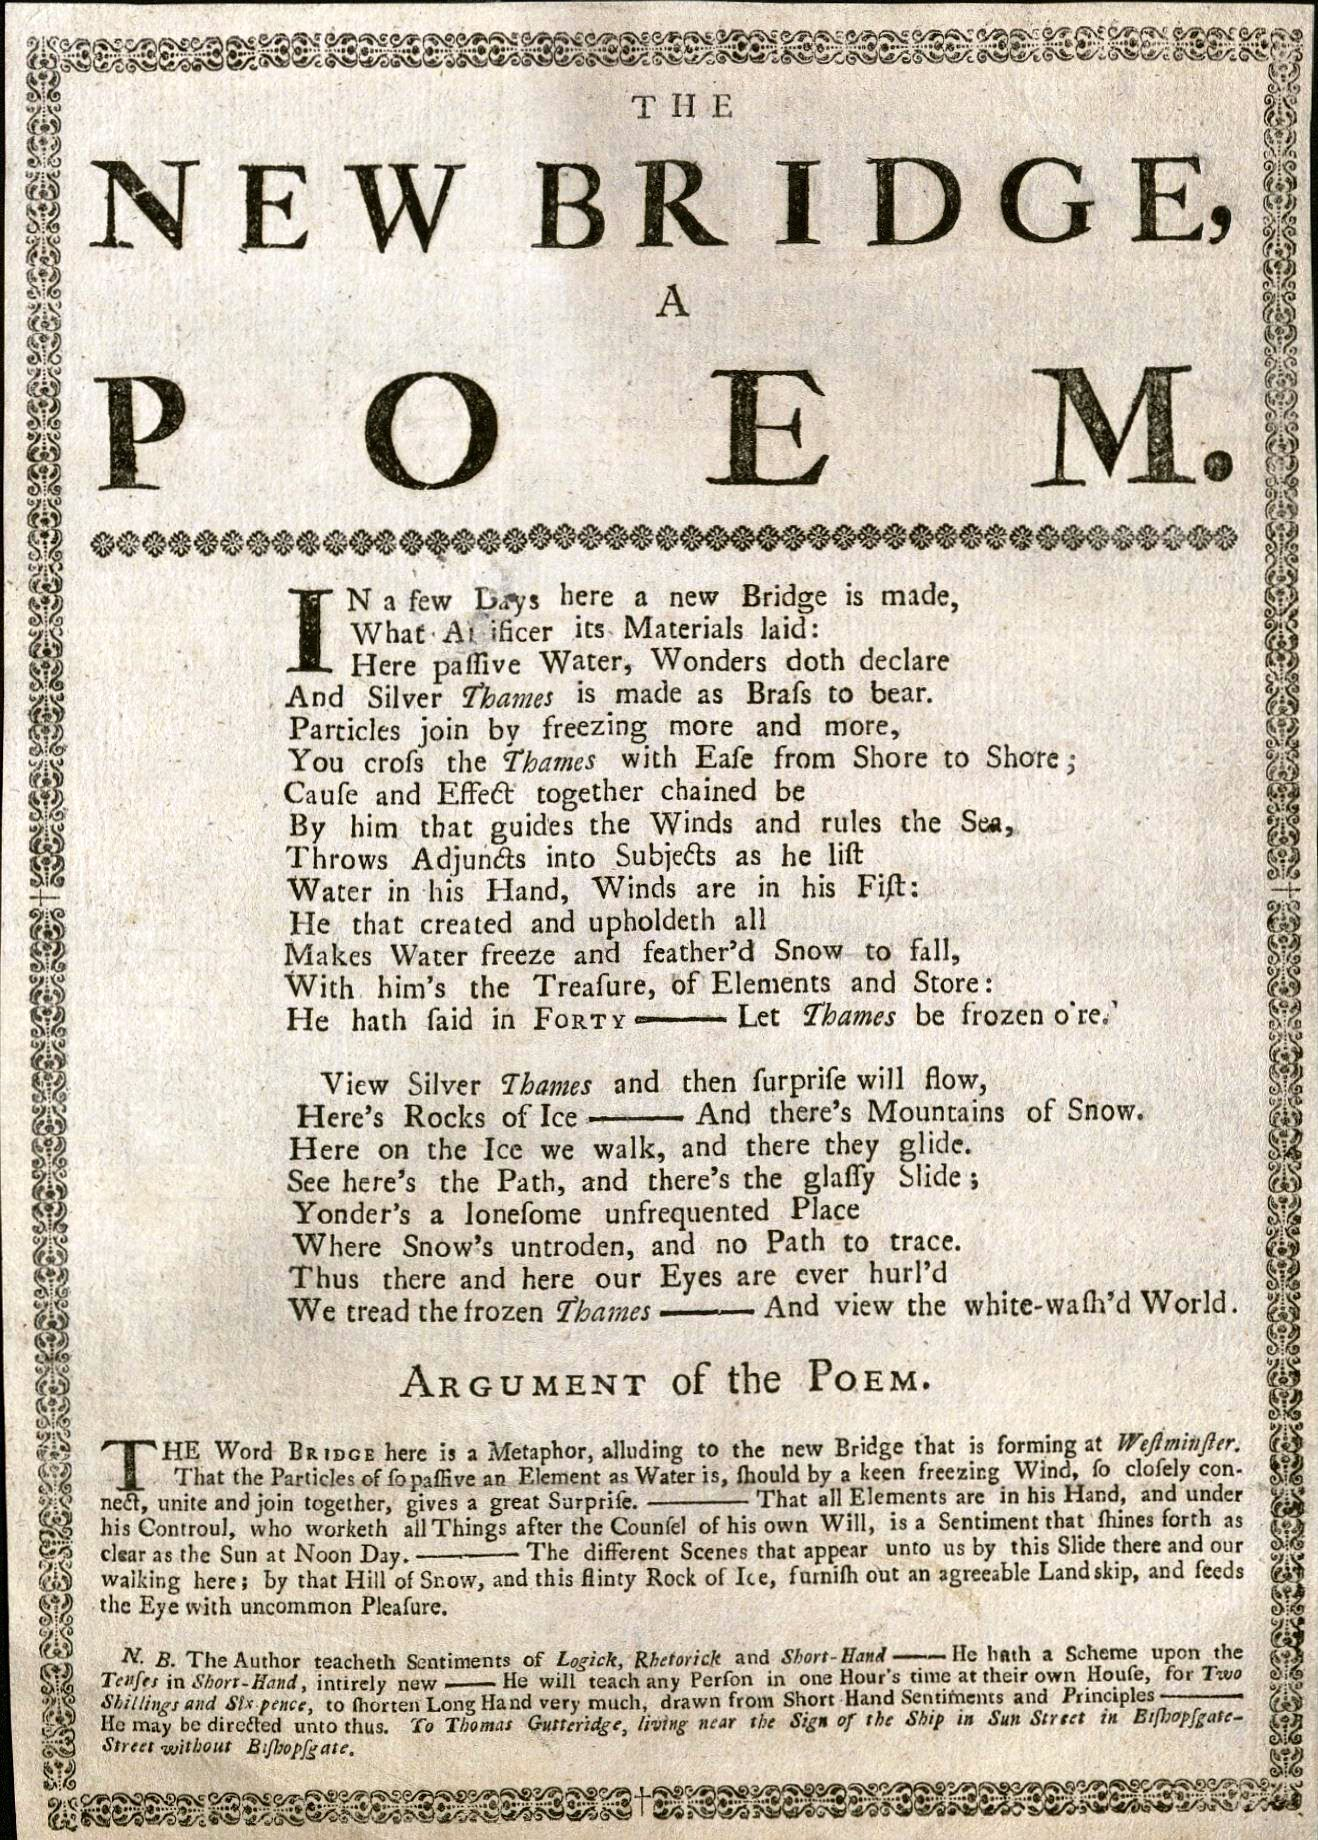 Thomas Gutteridge. The new bridge: a poem (1739 or 1740). Houghton EB7.G9878.739n